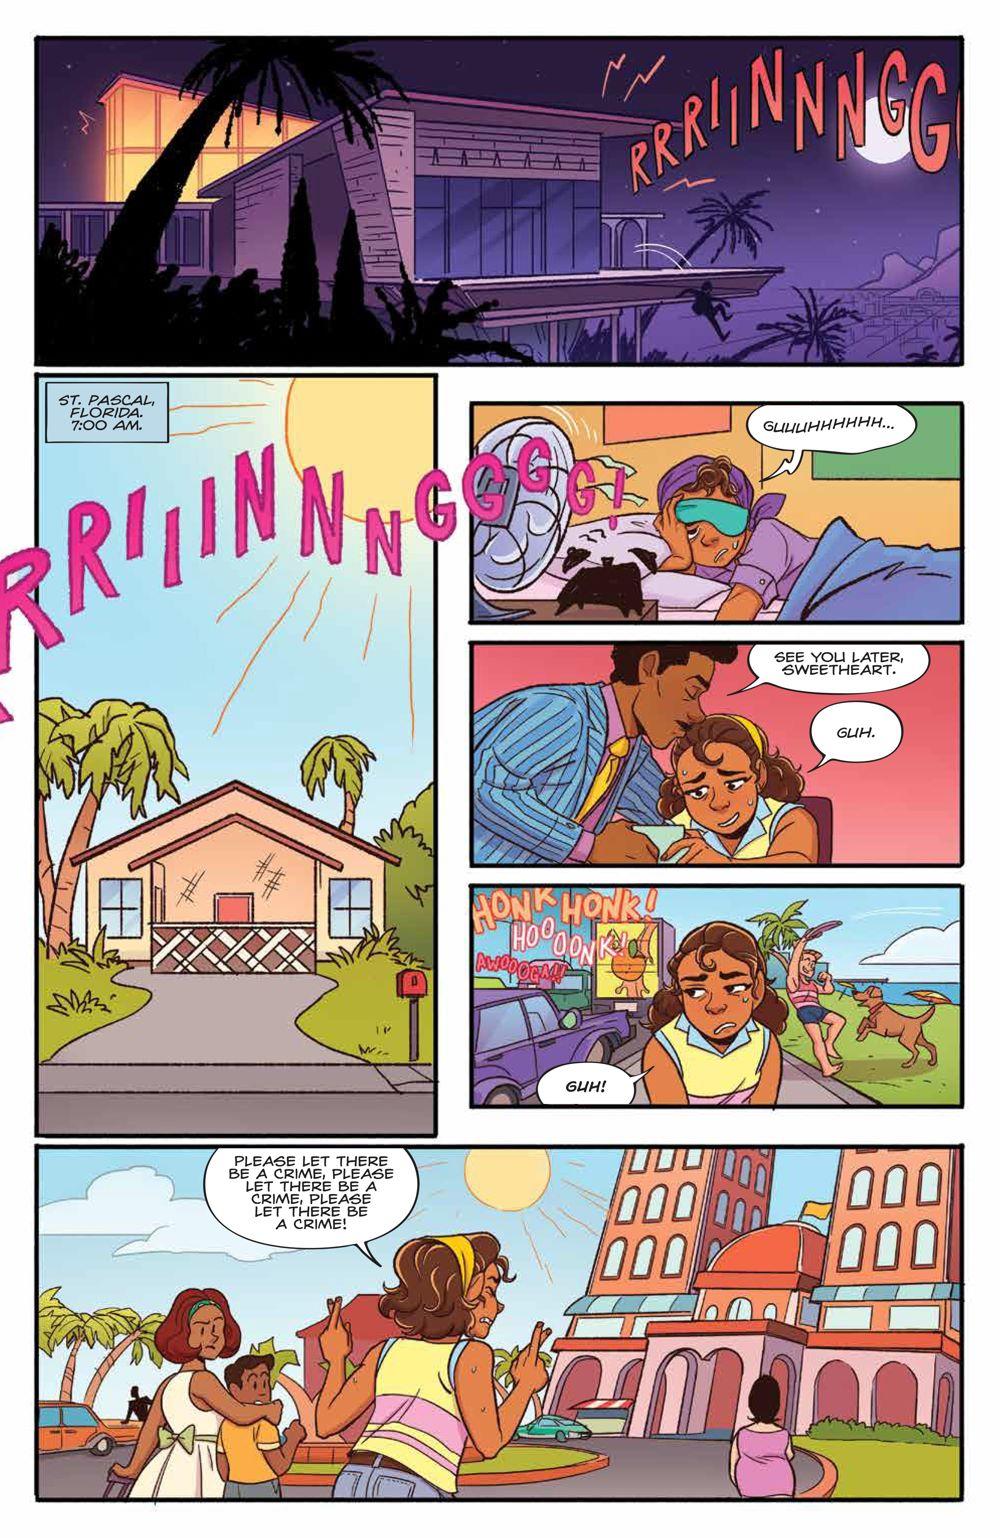 GoldieVance_OGN_LaLaLarceny_SC_PRESS_8 ComicList Previews: GOLDIE VANCE VOLUME 5 LARCENY IN LA LA LAND TP